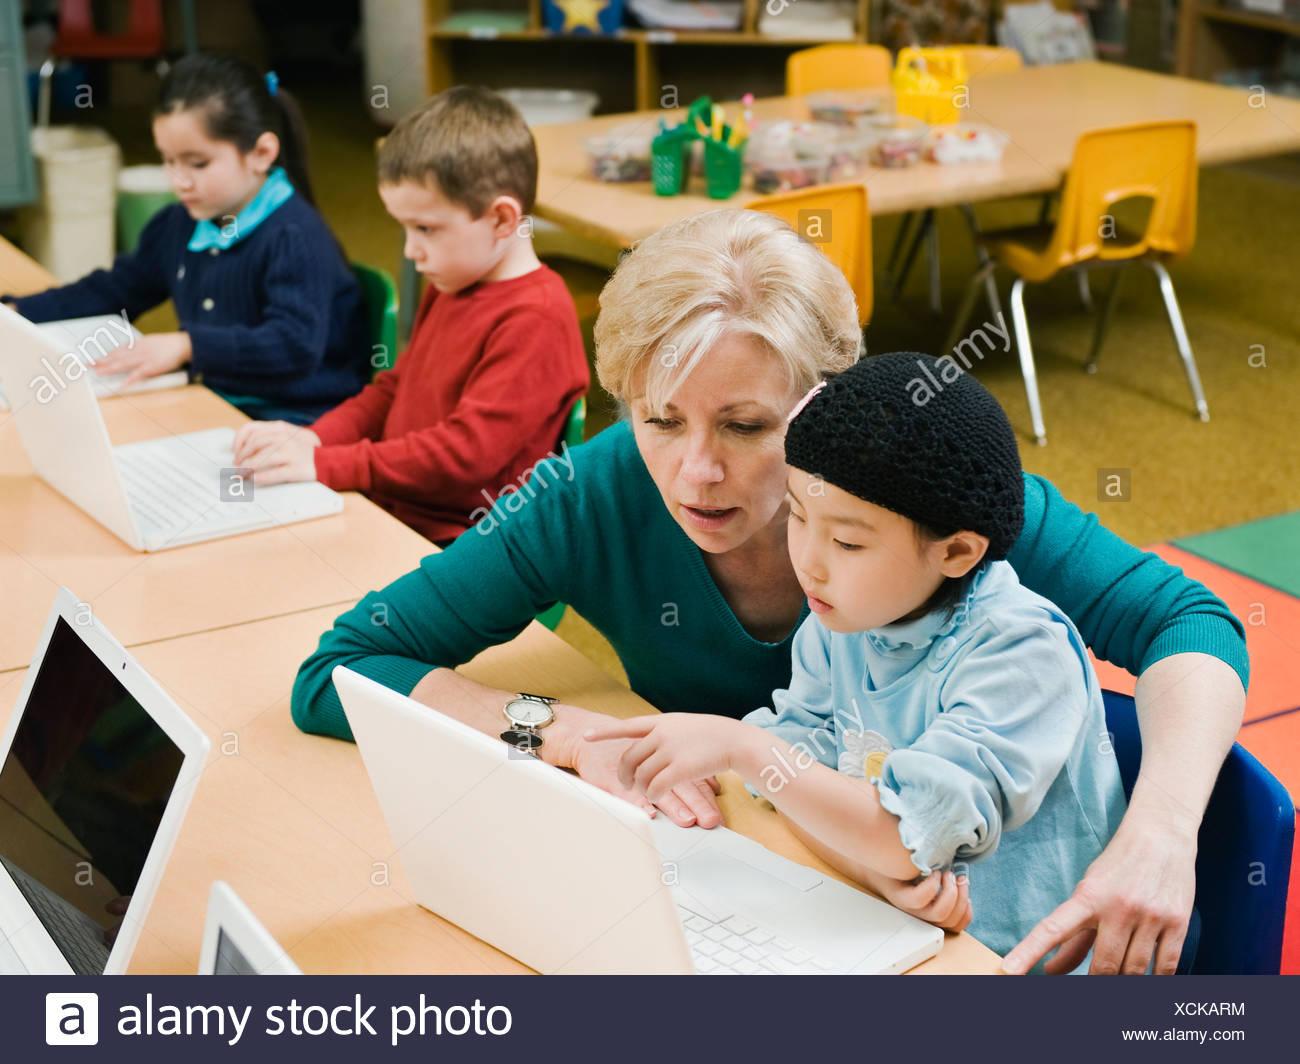 Teacher and kindergarten student looking at laptop - Stock Image